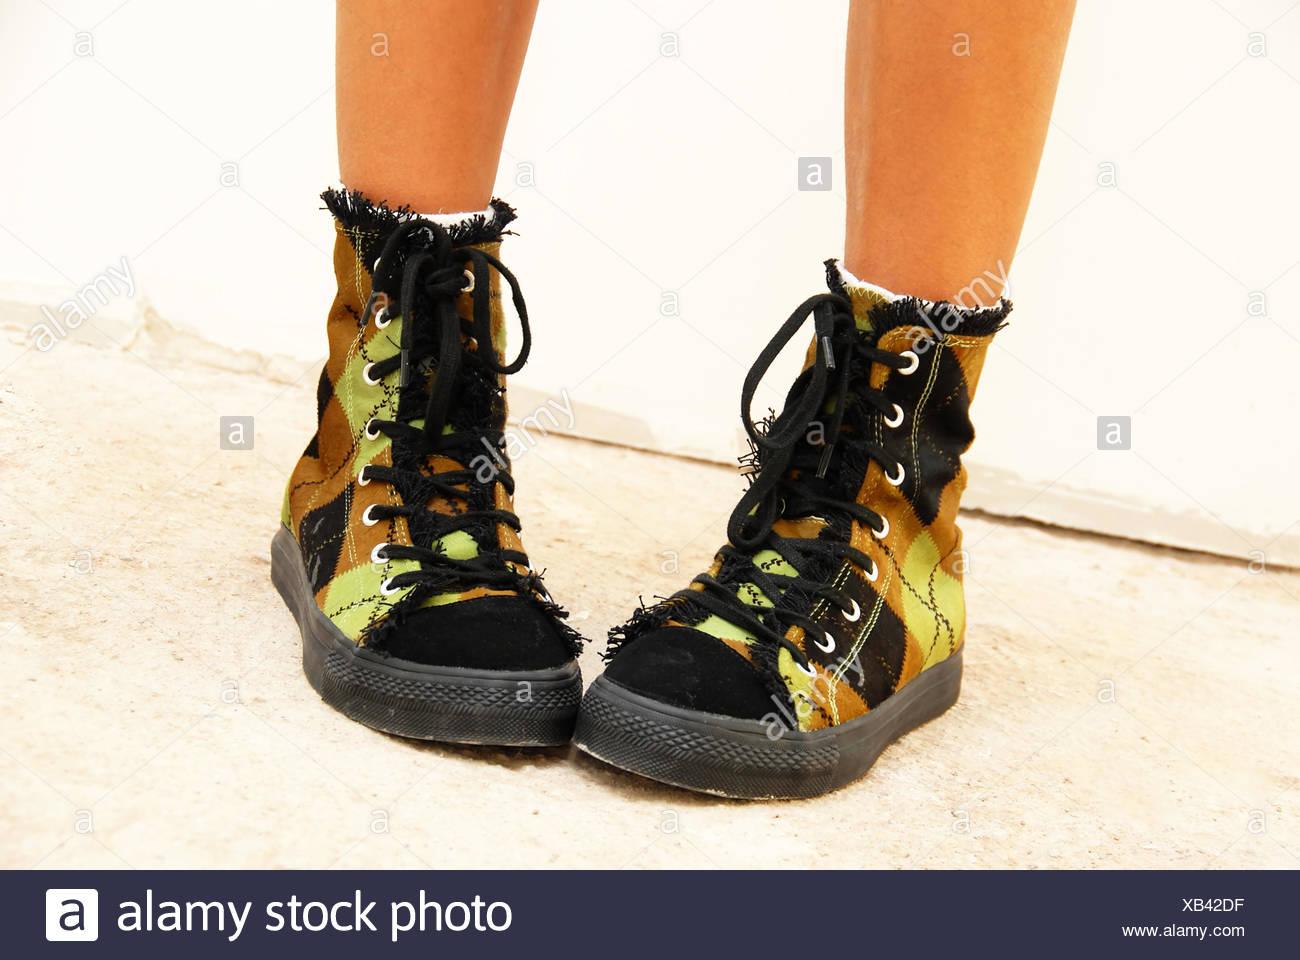 finest selection 7ac1b b67b9 Ausgefallene Schuhe Stockfoto, Bild: 282216859 - Alamy